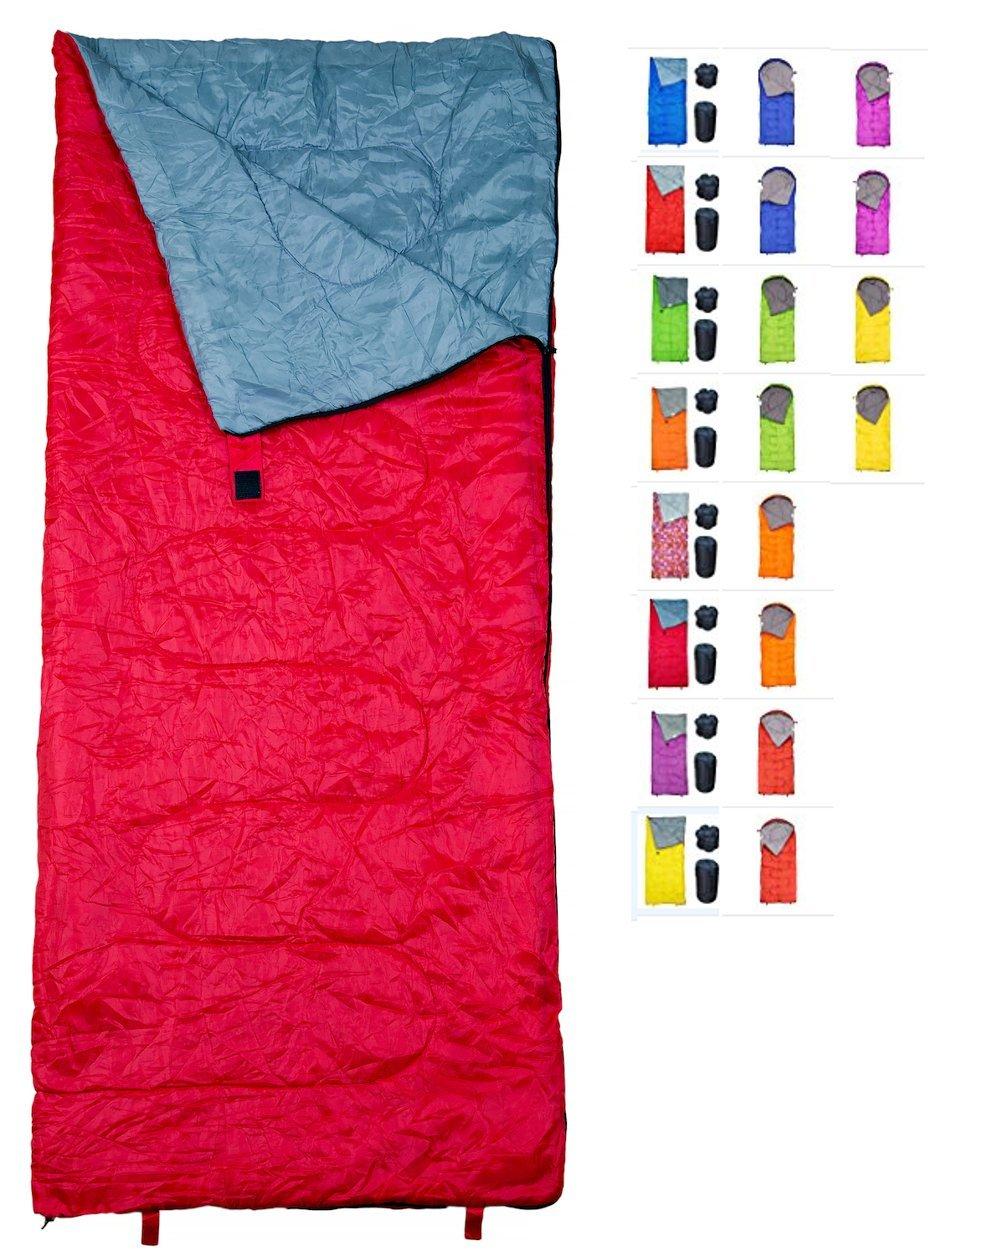 REVALCAMP Lightweight Sleeping Outdoor Backpacking